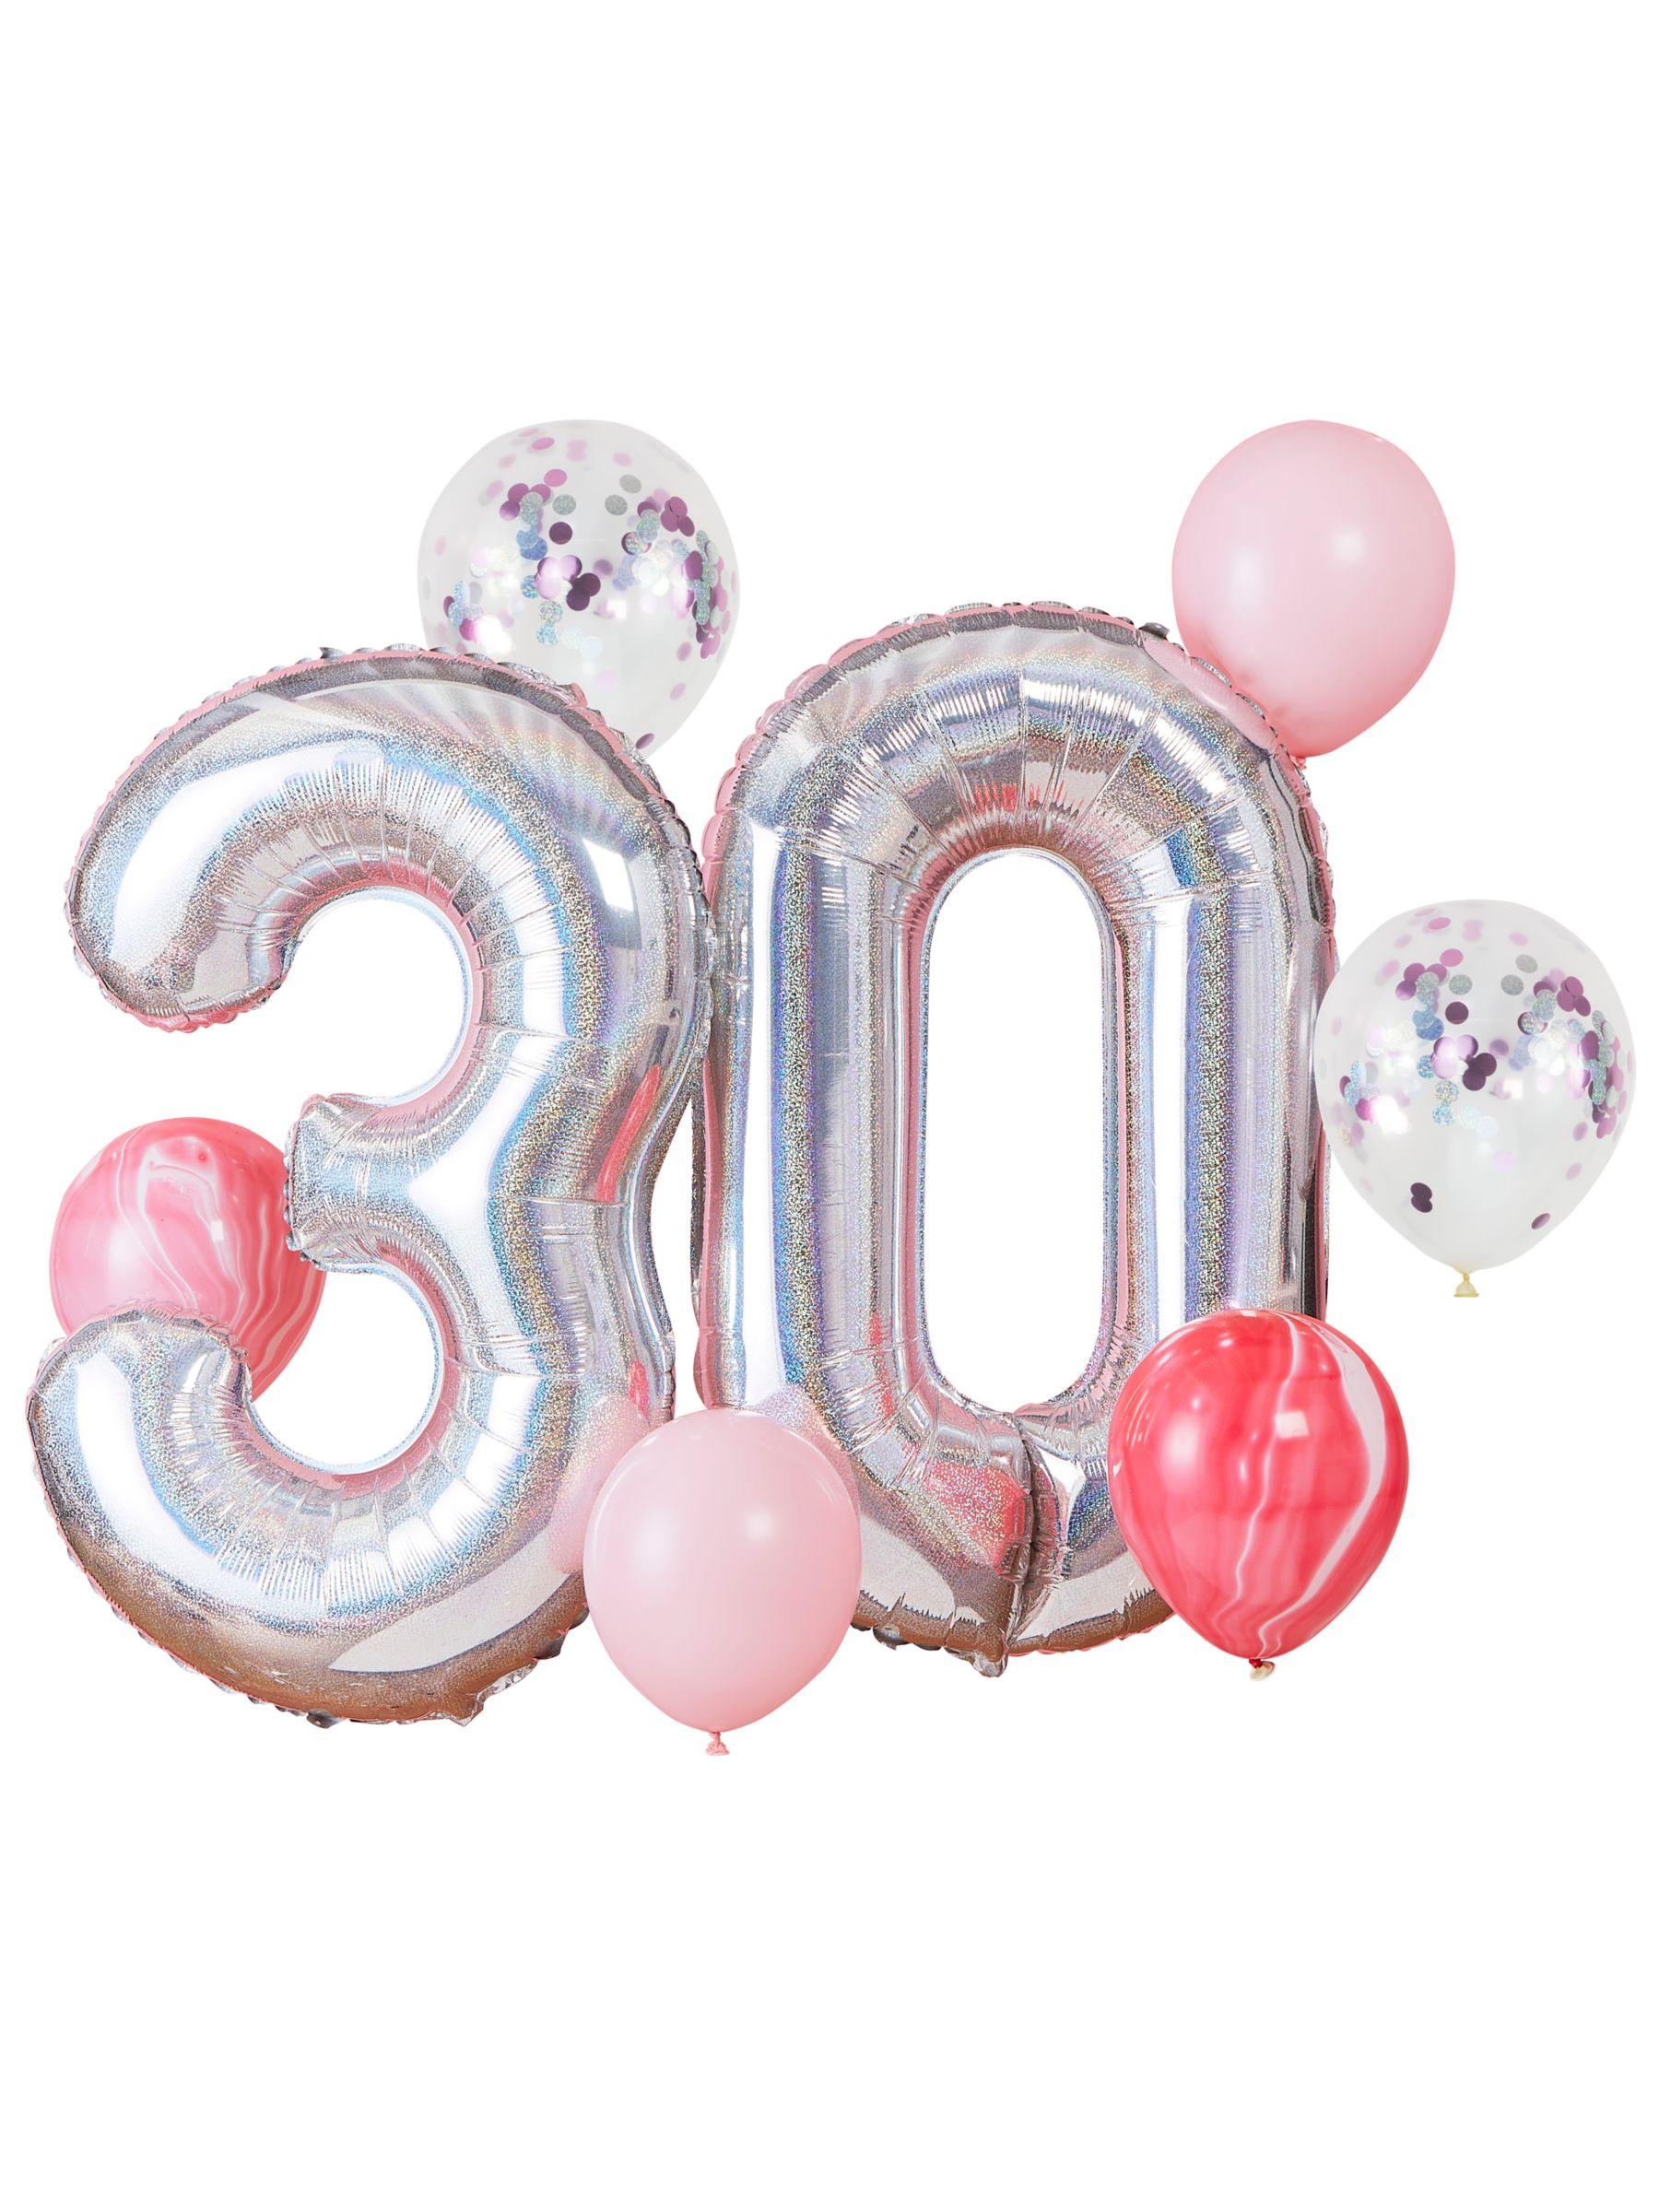 Ginger Ray Ginger Ray 30th Birthday Balloon Bundle